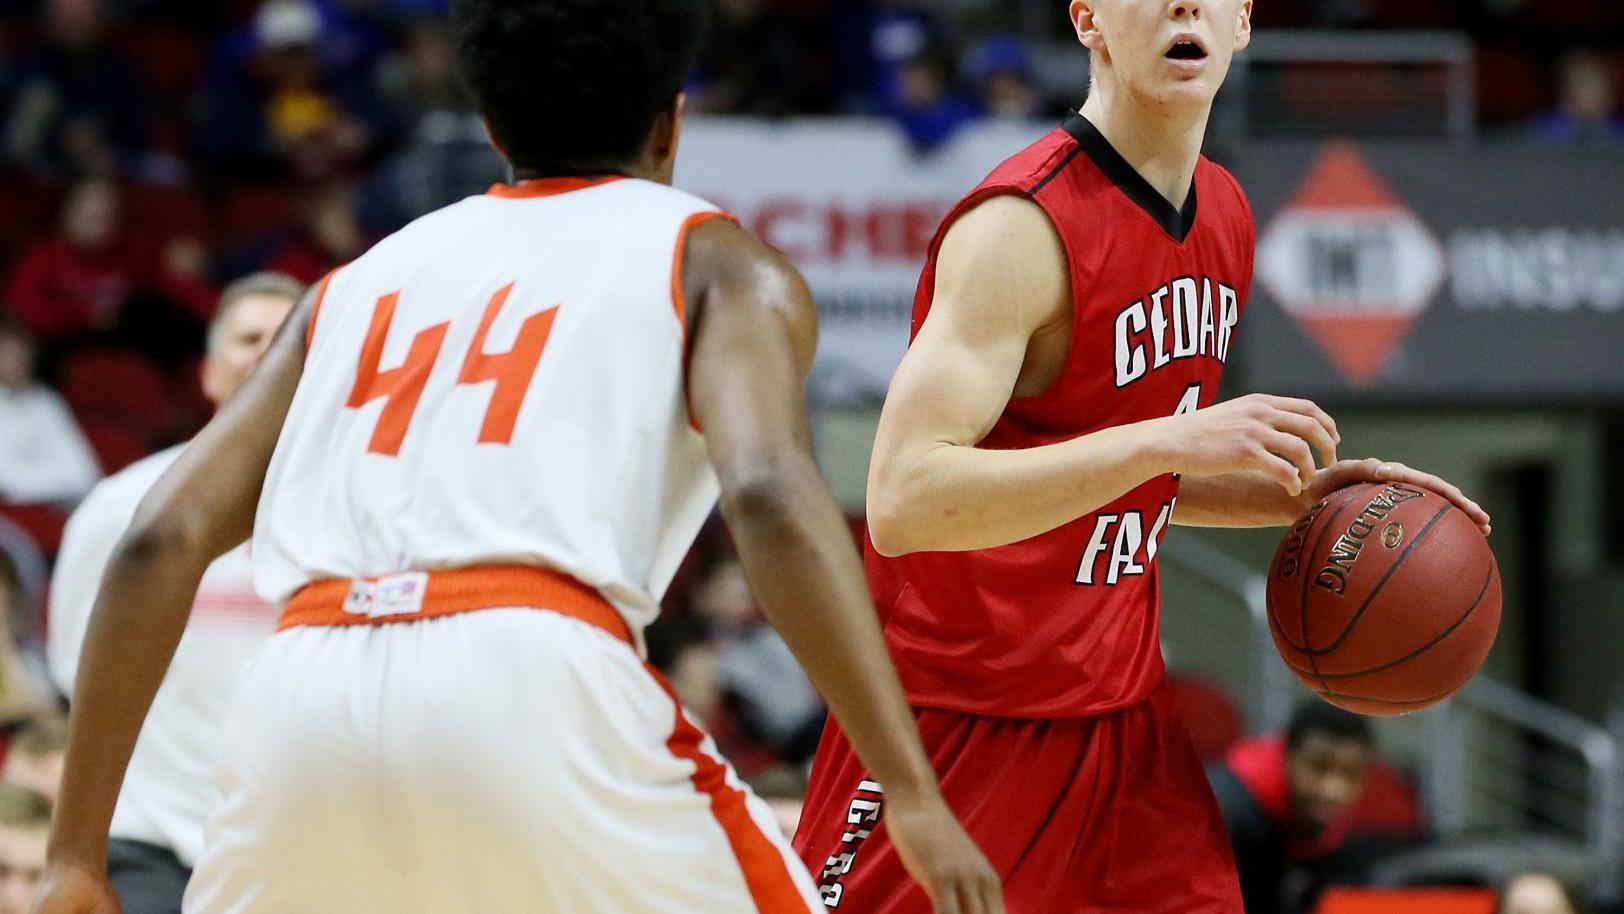 Boys' state basketball: Cedar Falls reaches first state final, 67-58